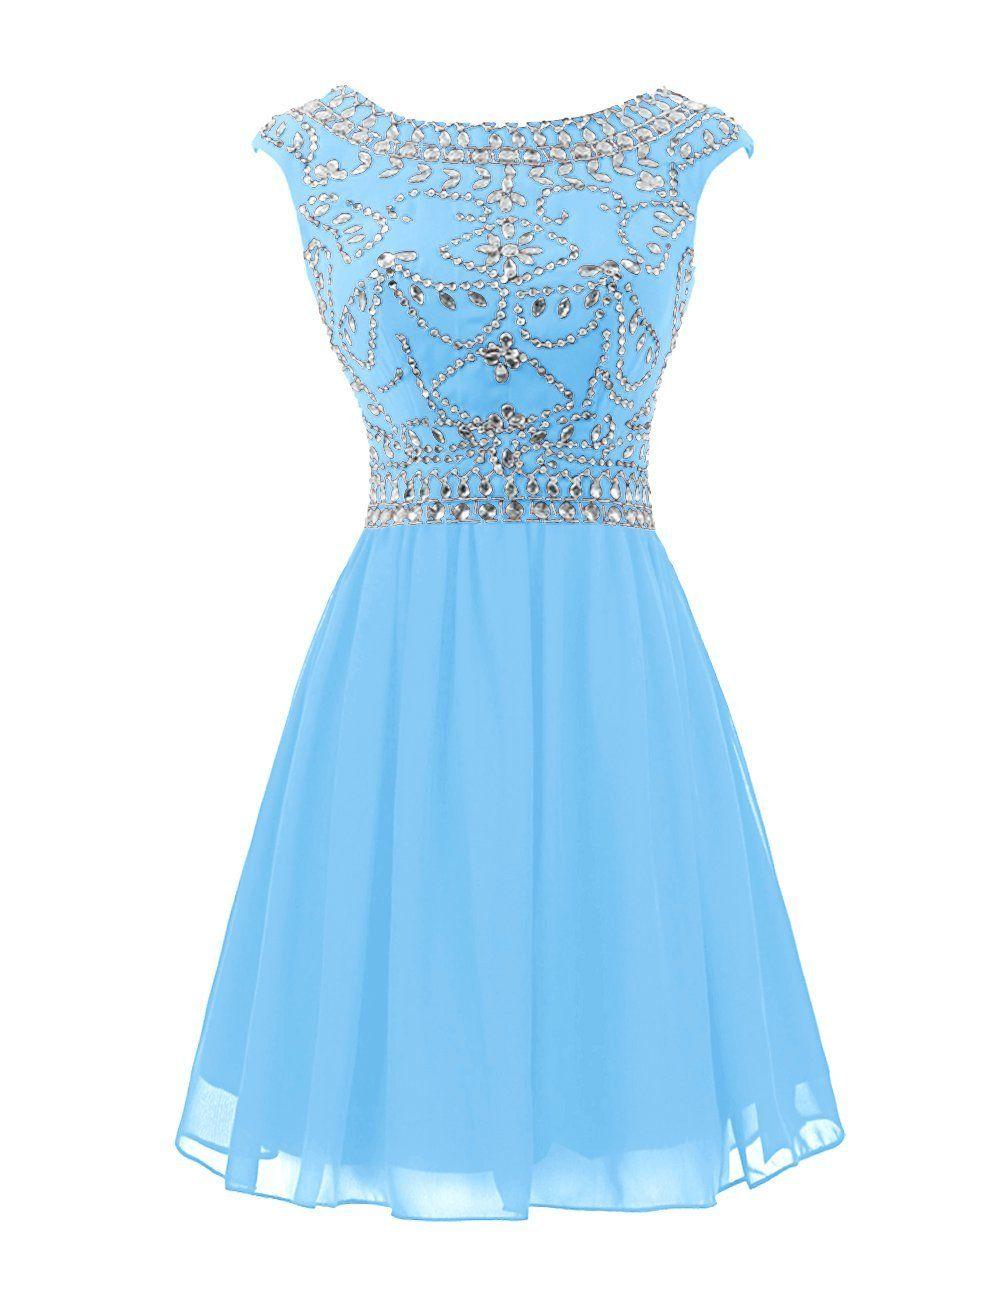 48659b36603 Wedtrend Women s Short Prom Dress with Beads Chiffon Cocktail Dress  Birthday Gown  Amazon Fashion